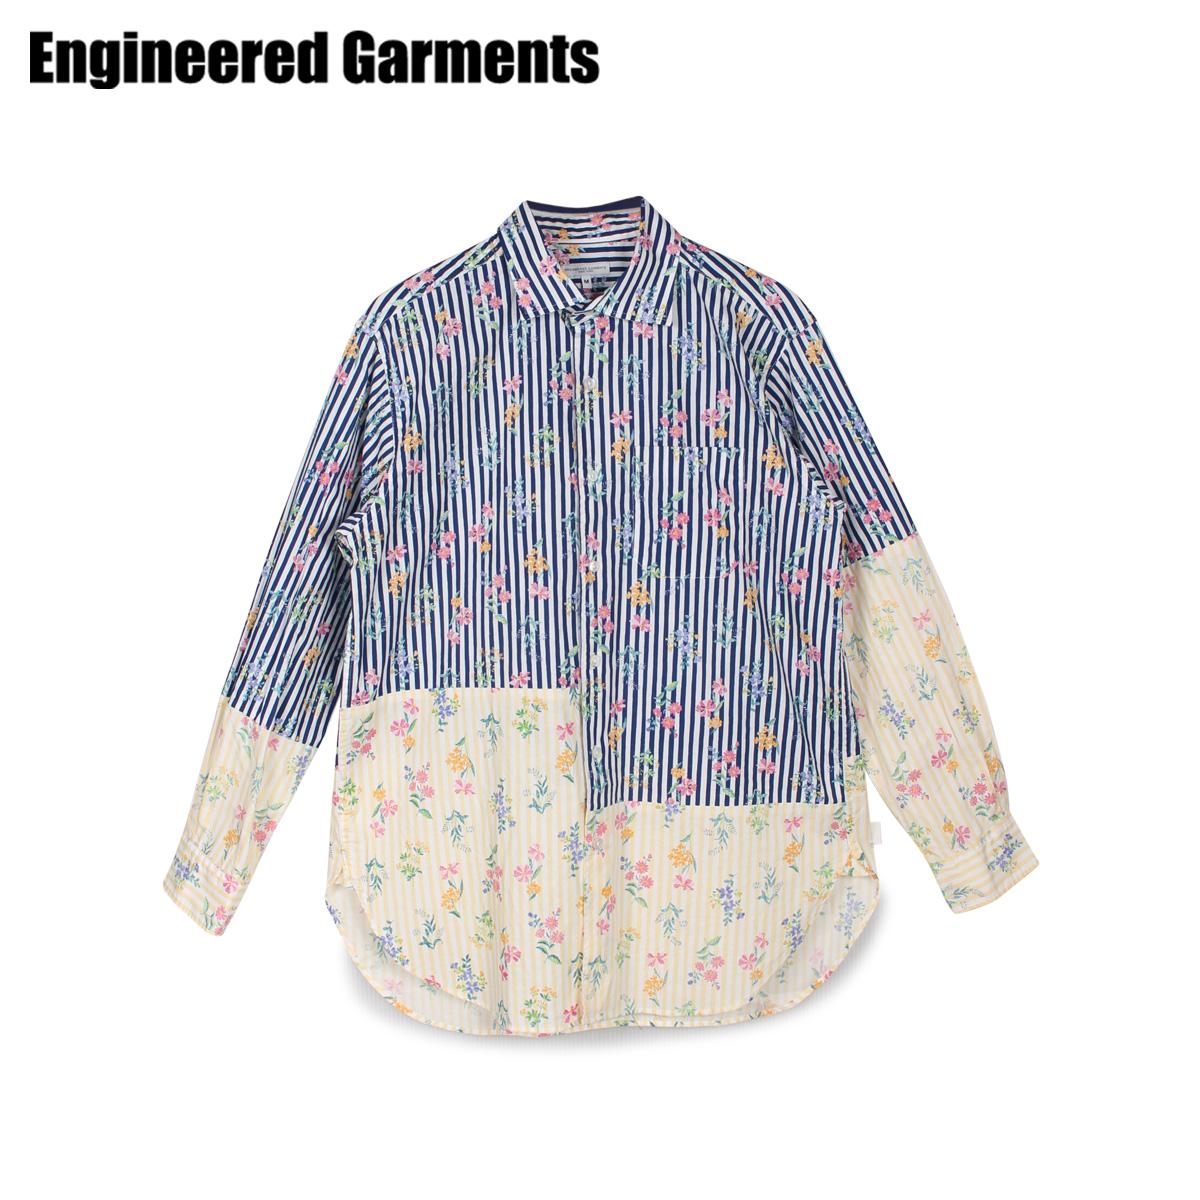 ENGINEERED GARMENTS エンジニアドガーメンツ シャツ 長袖 オックスフォードシャツ メンズ SPREAD COLLAR SHIRT ネイビー 20S1A013